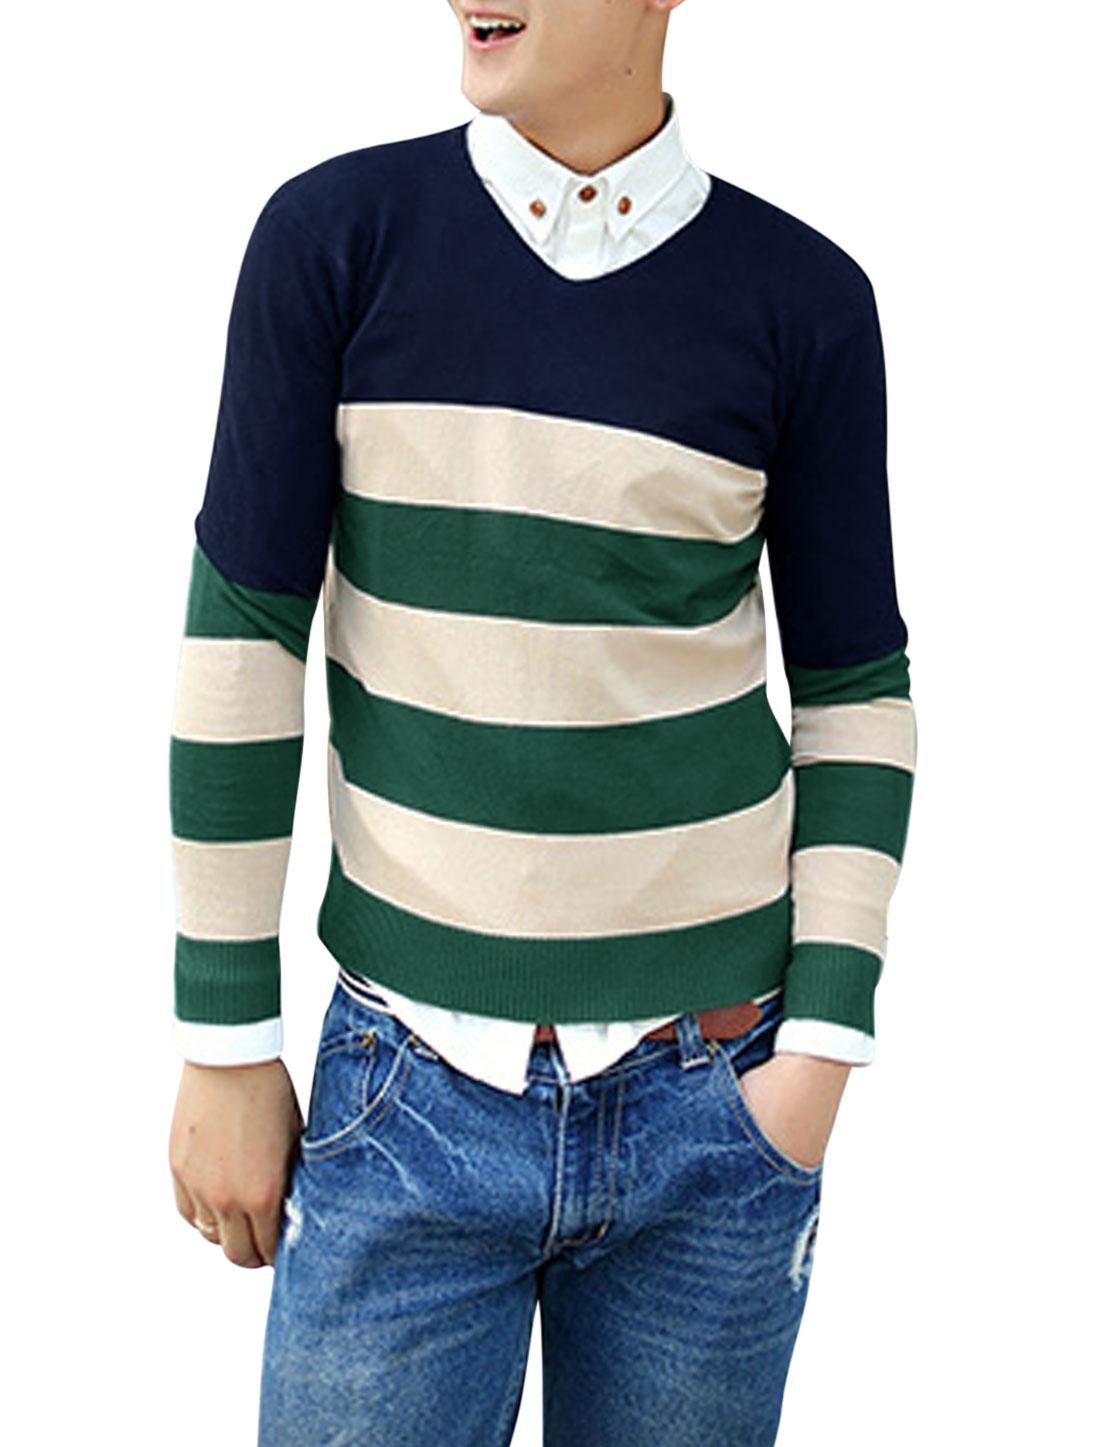 Men Long Sleeves Stripes Slipover Casual Navy Blue Knit Shirt M